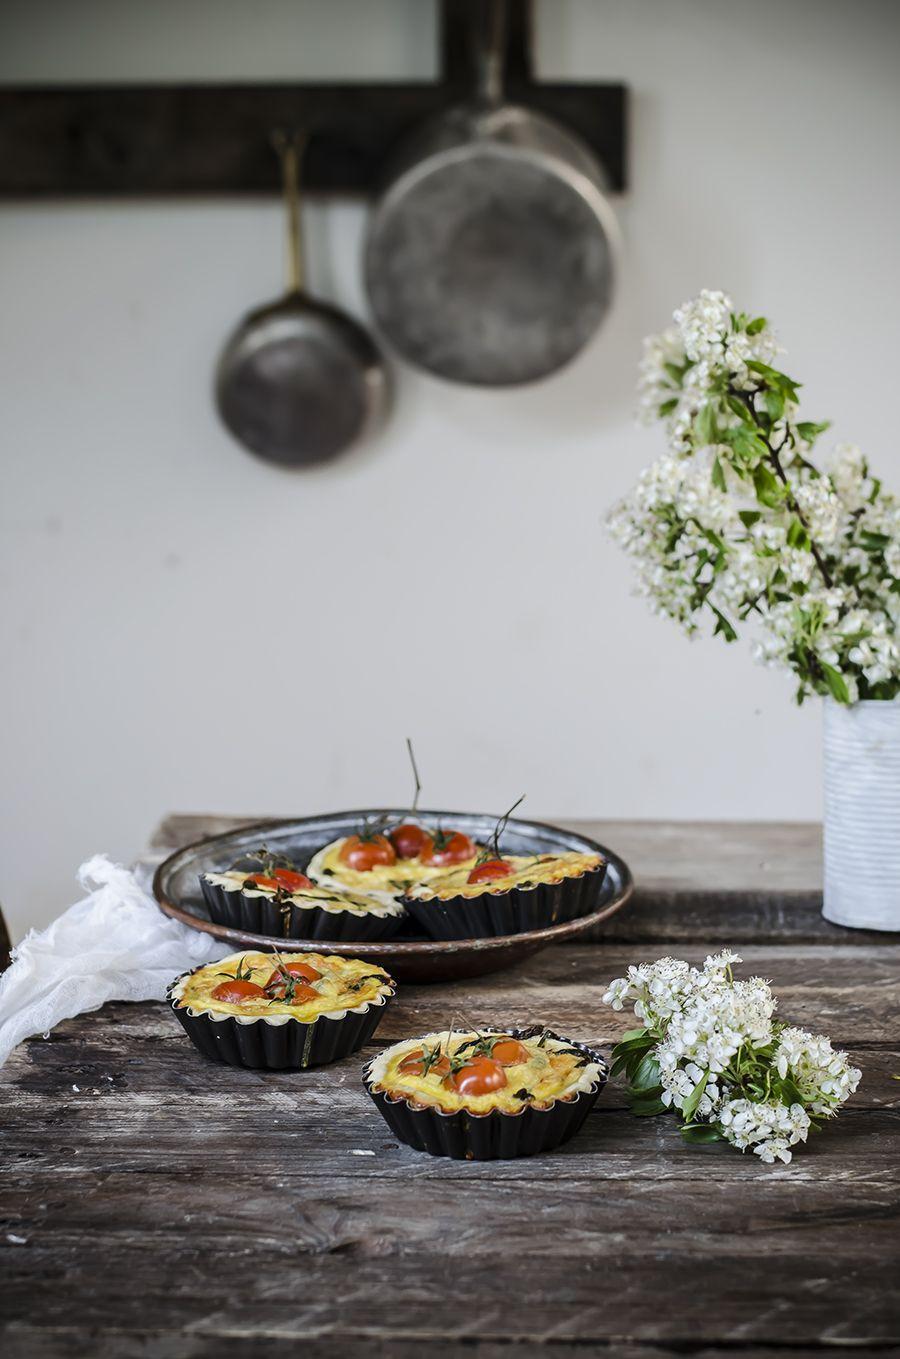 Mini quiche con asparagi, feta e pomodorini Tarts with feta cheese, cherriy tomatoes and asparagus